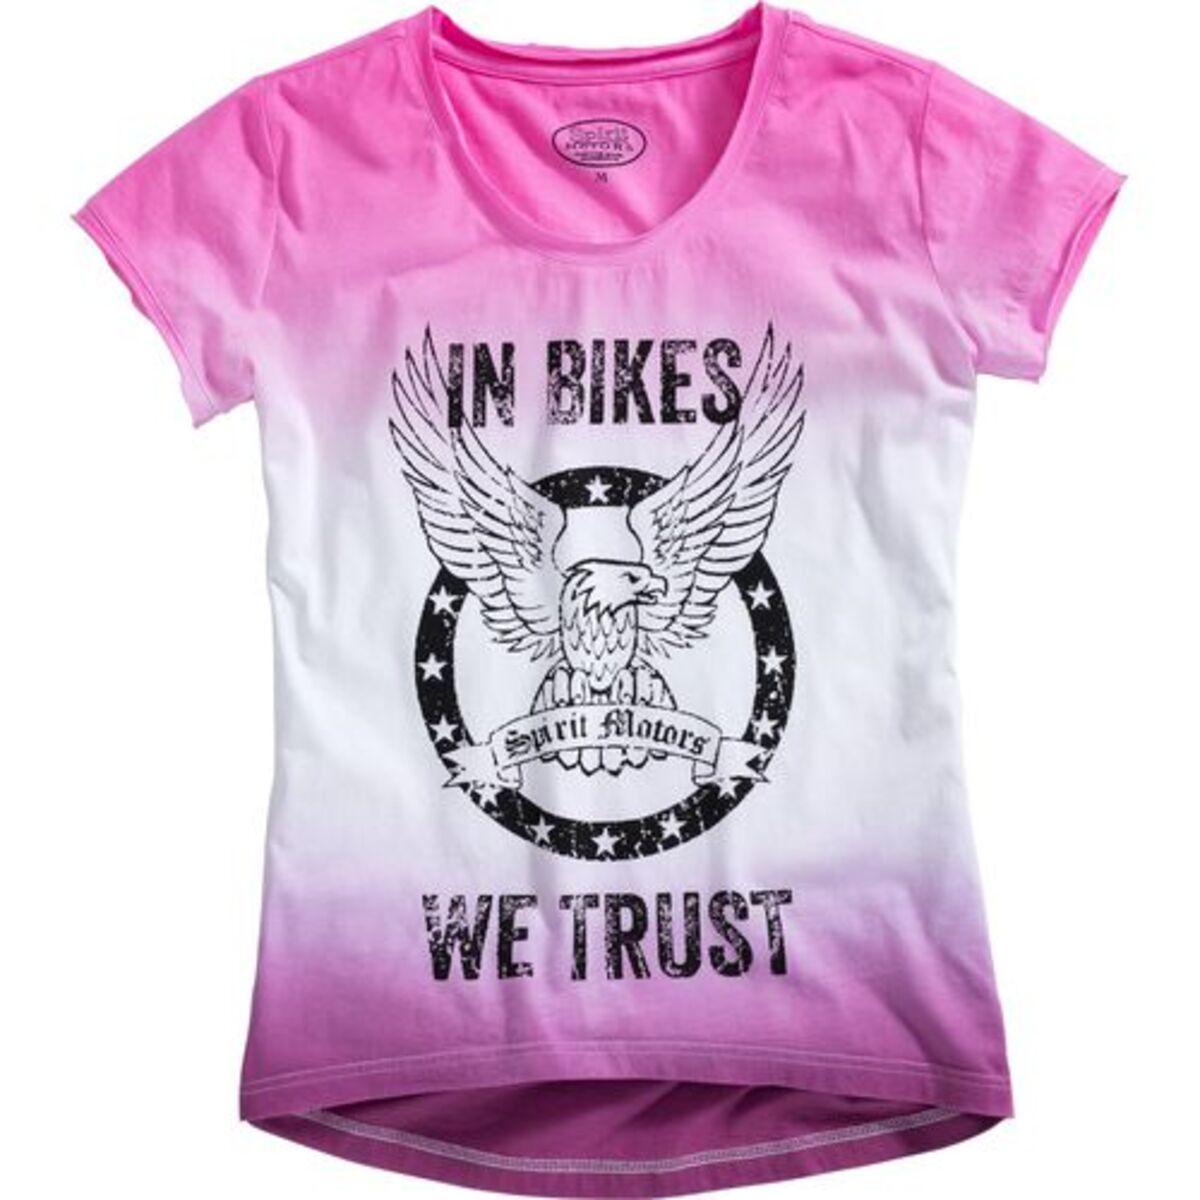 Bild 1 von Spirit Motors            T-Shirt 1.0 rosa